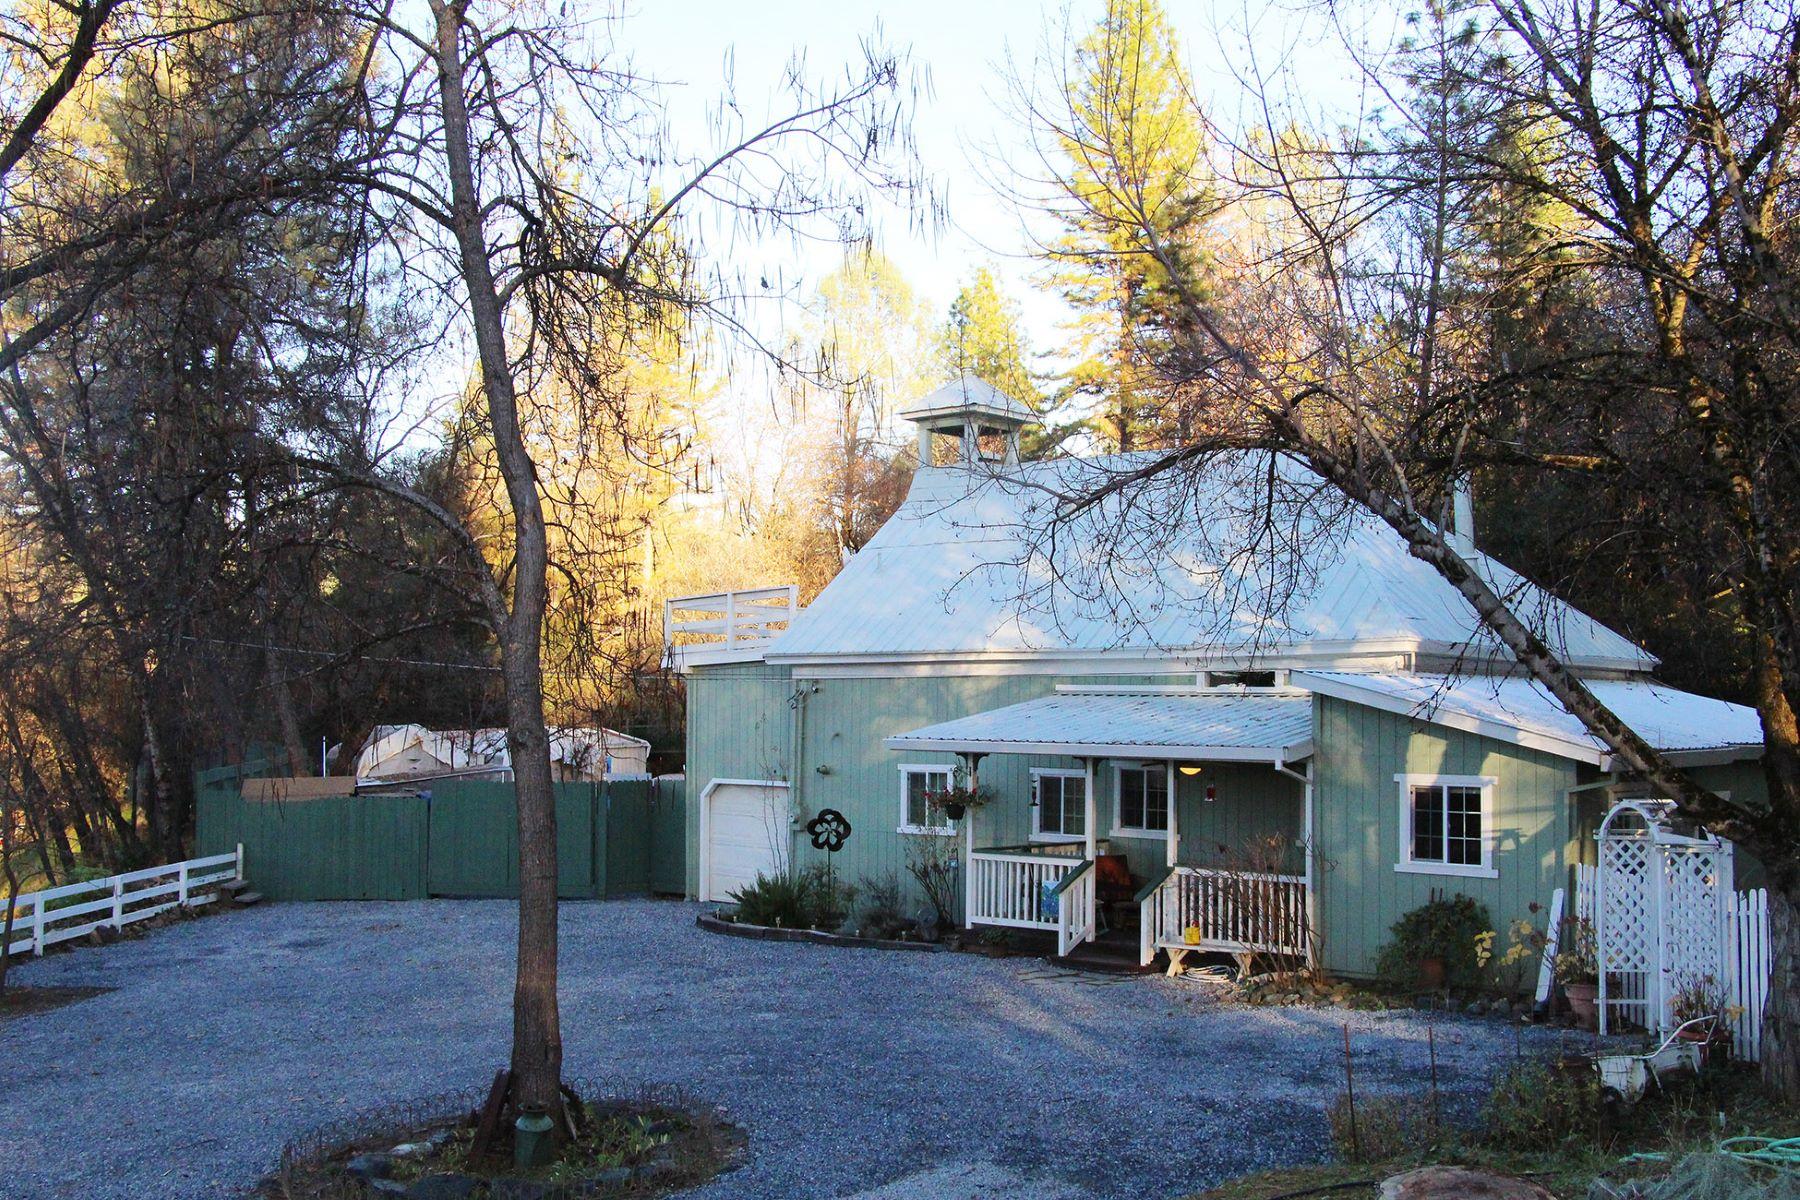 獨棟家庭住宅 為 出售 在 Classic Country Charmer 4820 Sand Ridge Road Placerville, 加利福尼亞州 95667 美國